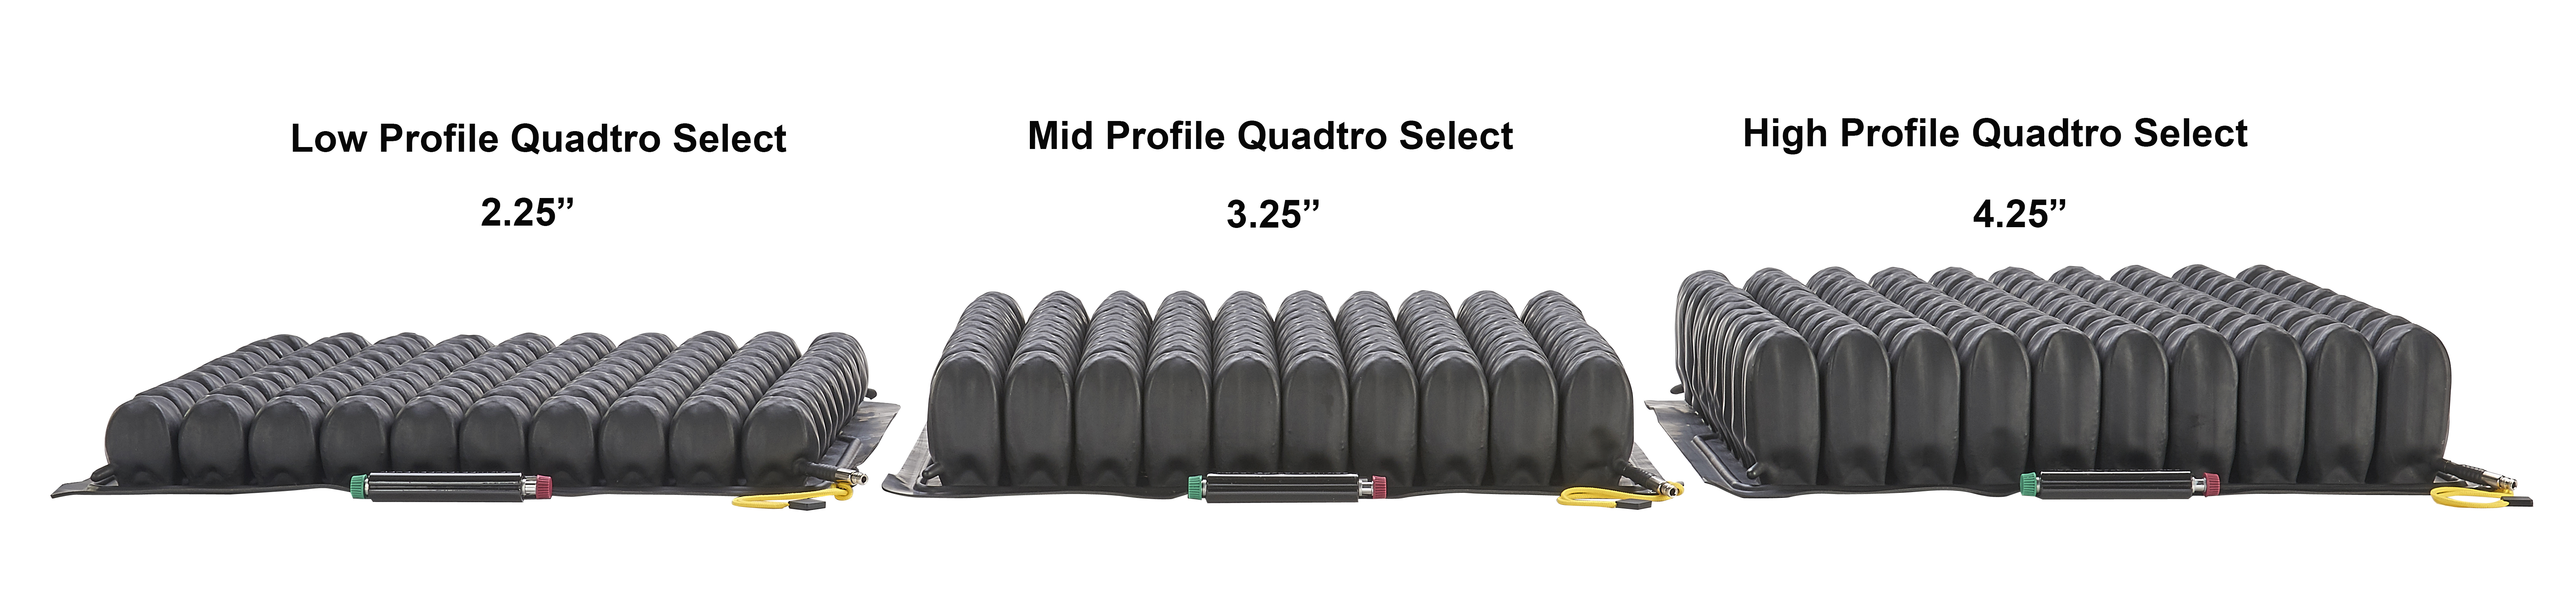 Roho High Profile Quadtro Select Wheelchair Cushion At Indemedical